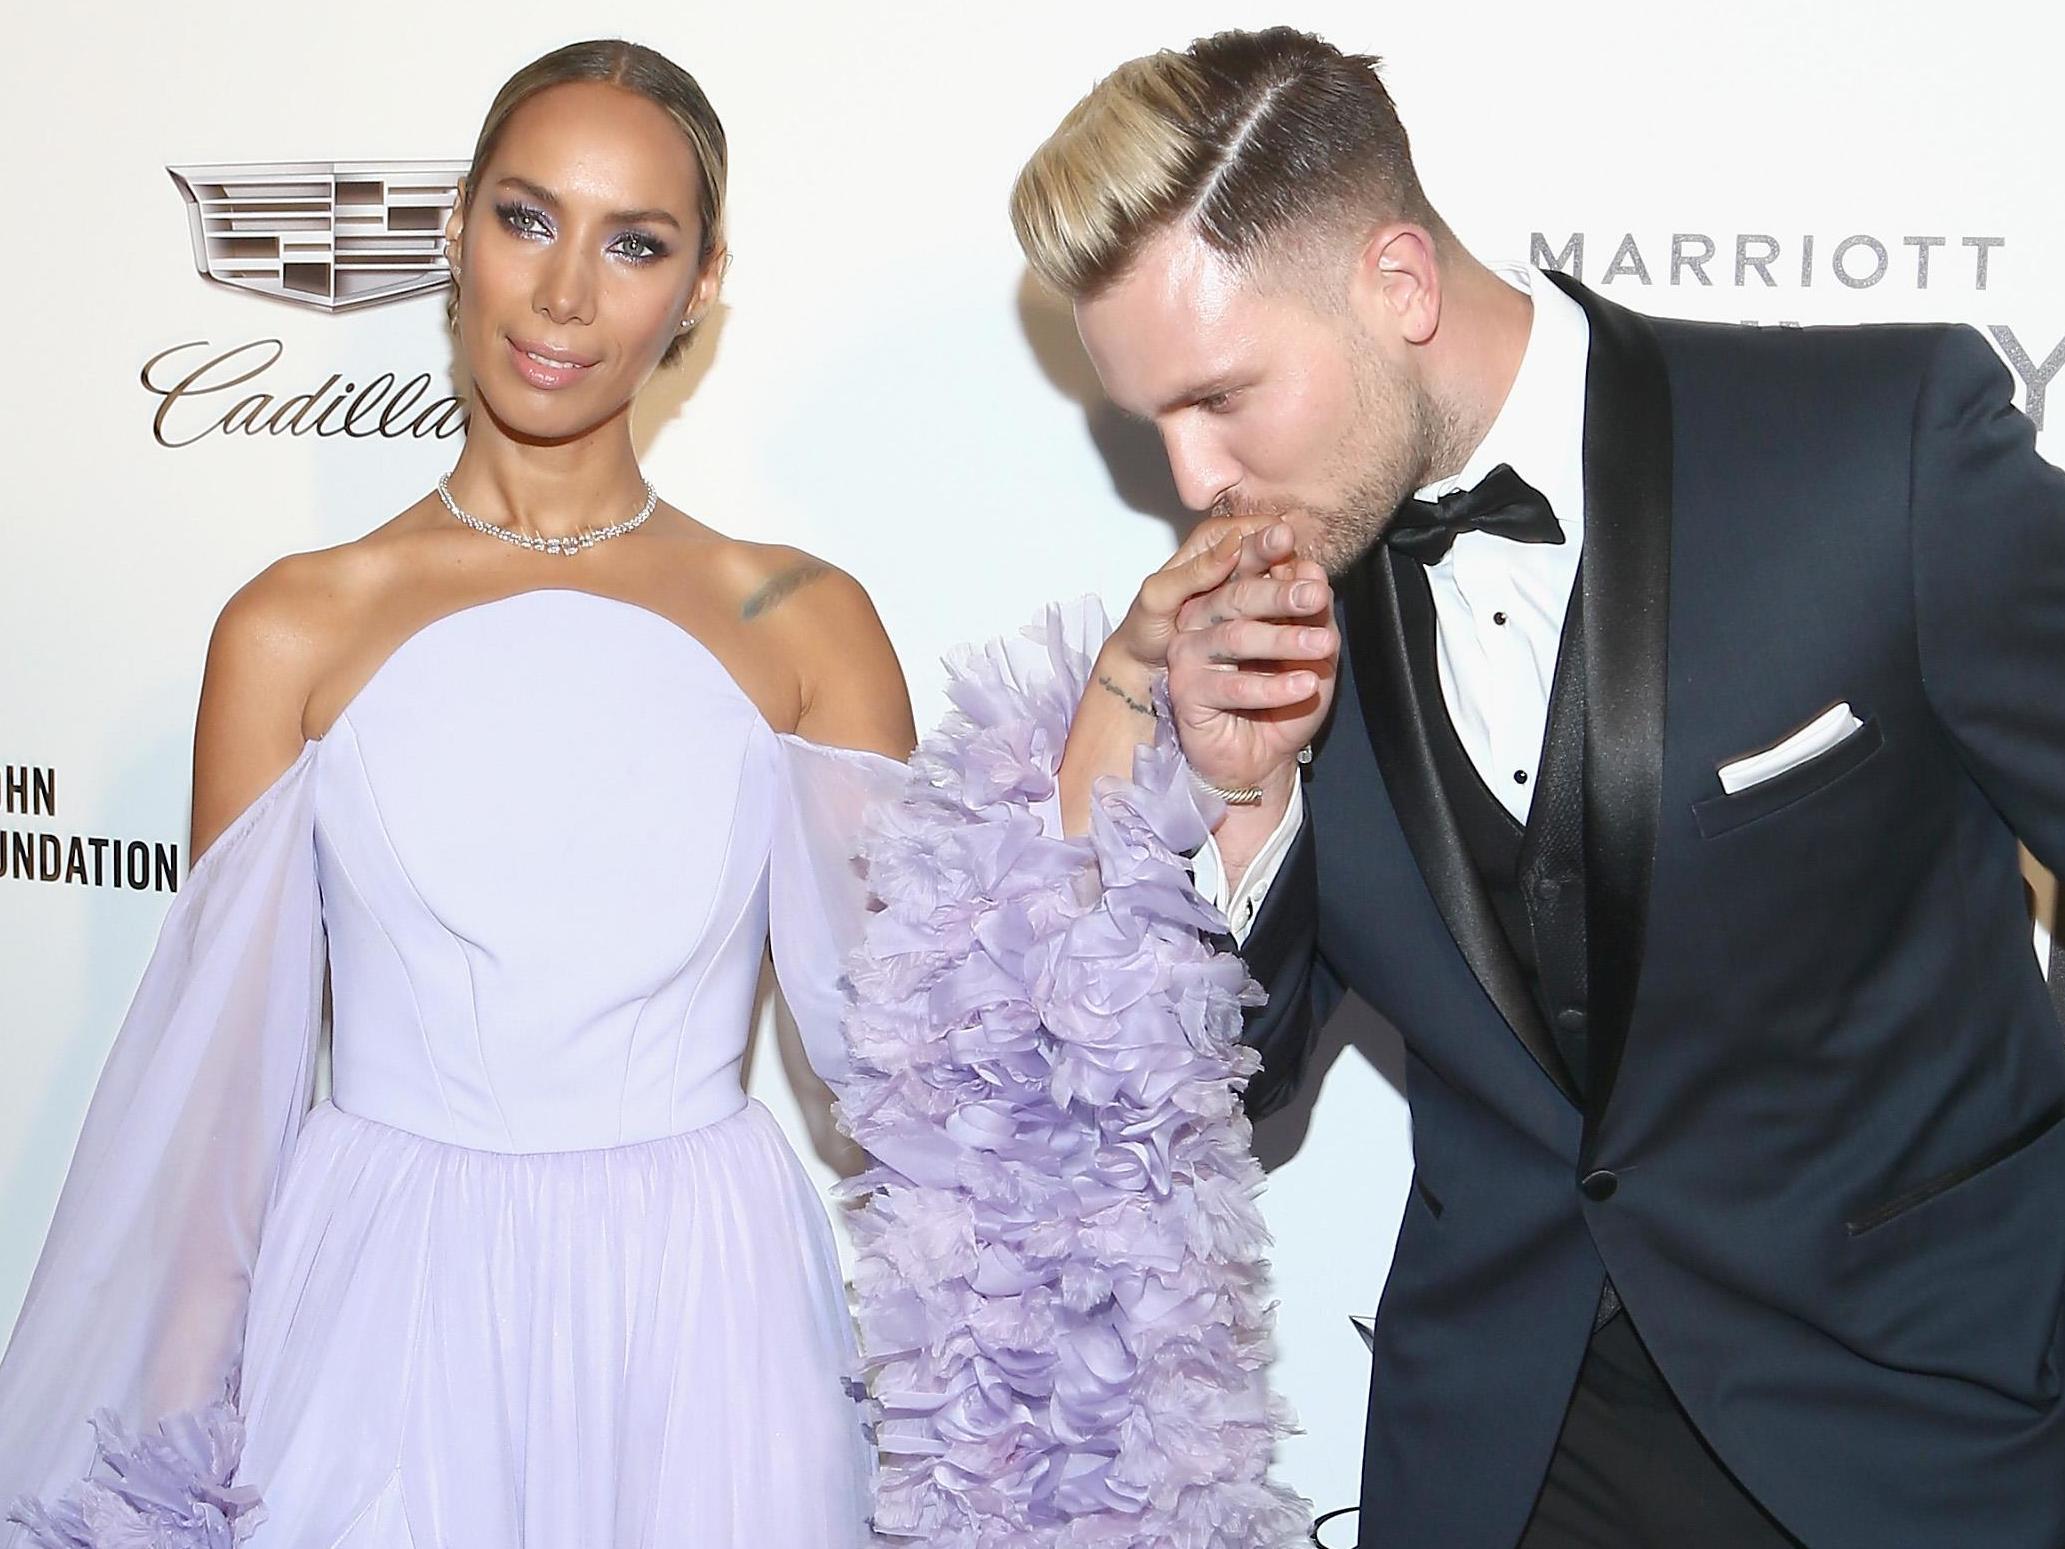 John Lewis Wedding Insurance Promo Code: Leona Lewis Wedding: Singer Shares Photos From Star